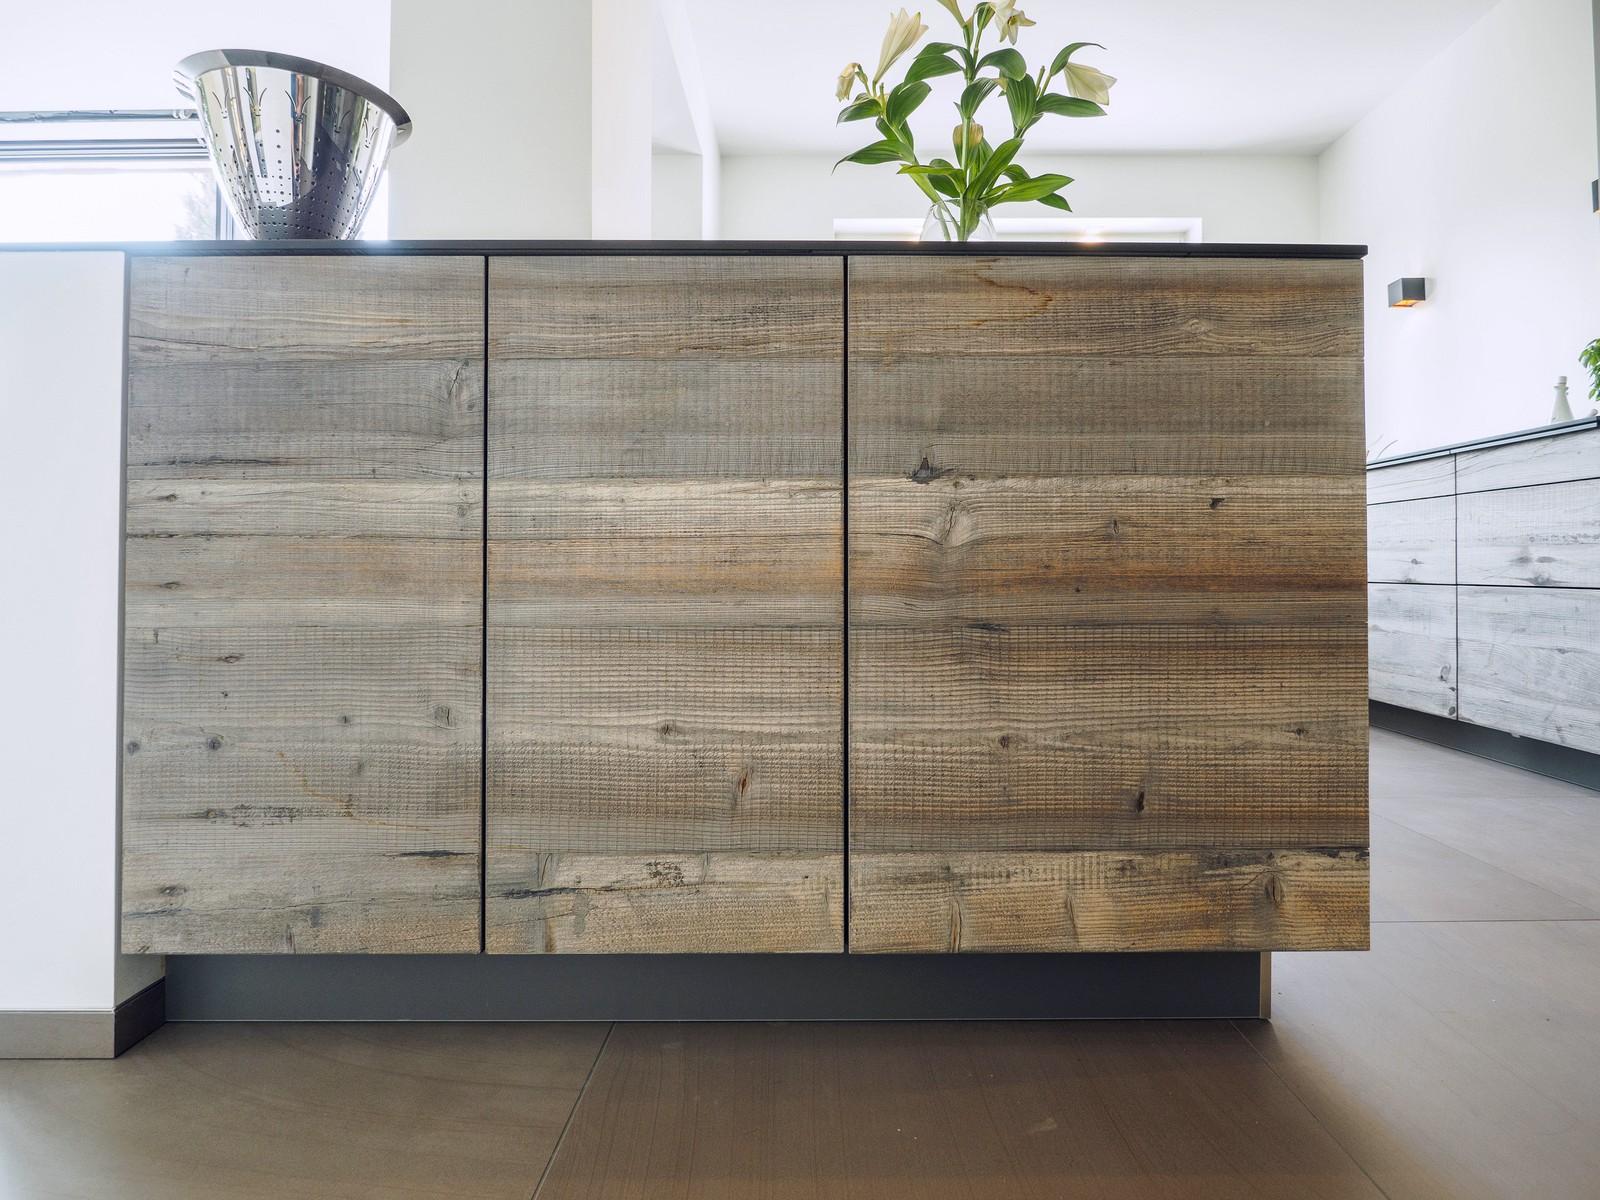 Kueche Exklusiv Design Fronten Holz Furnier Sonnenverbrannt Stahl Keramik Arbeitsplatte Miele 8